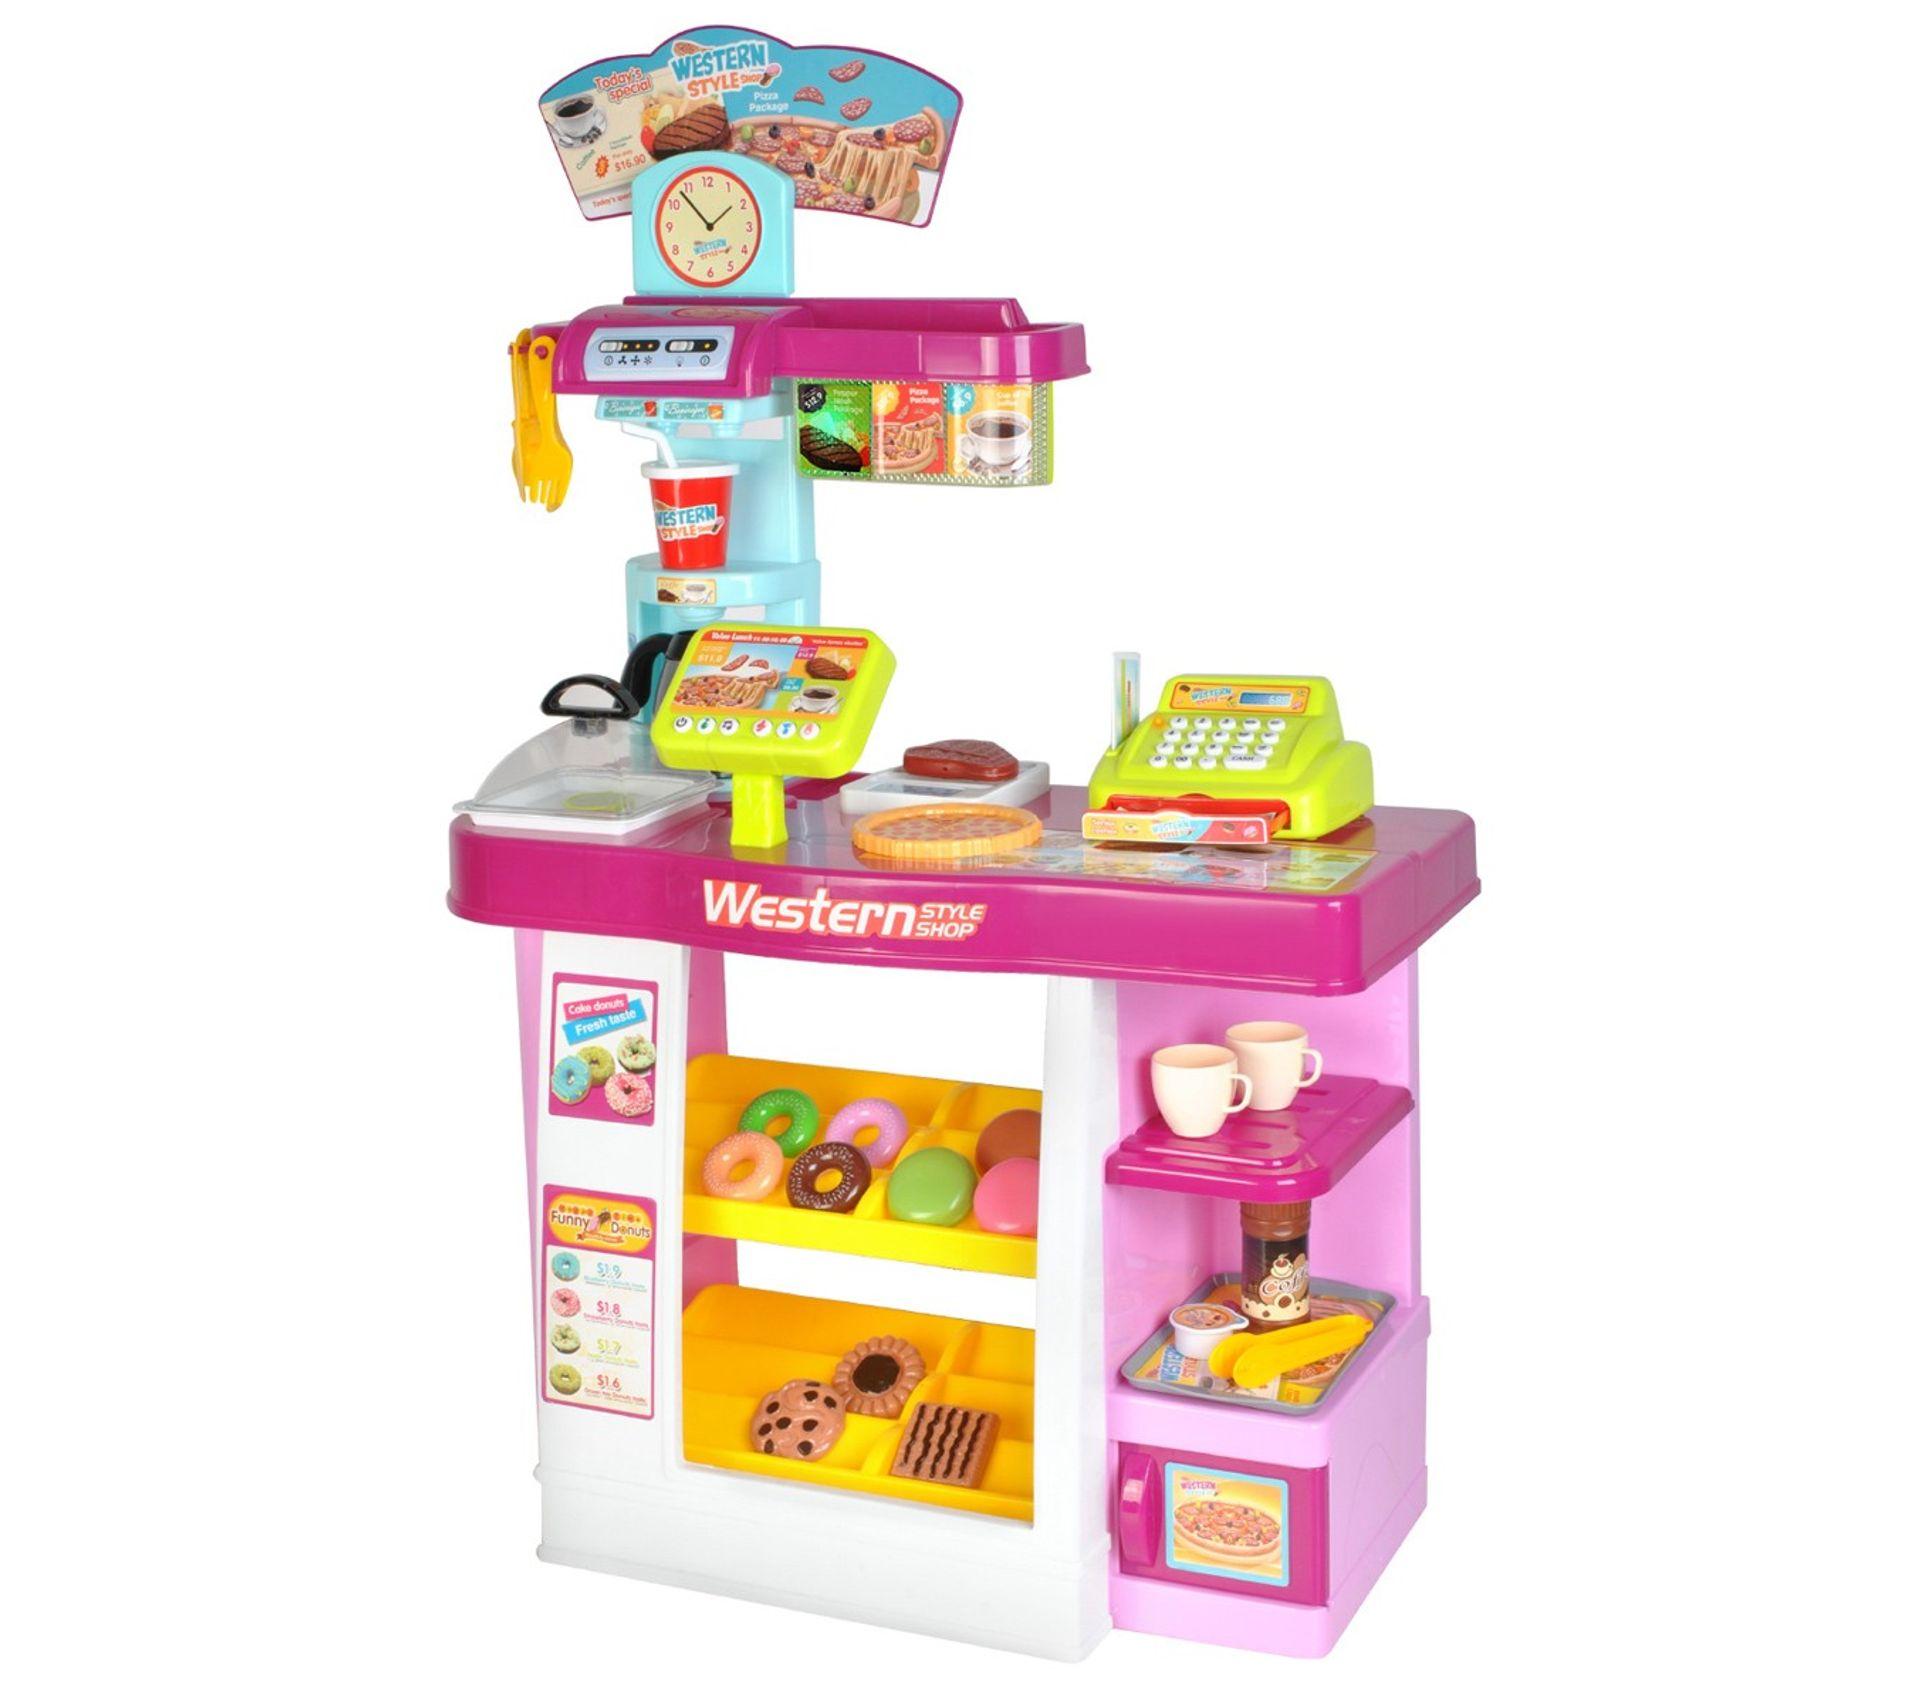 Kids Kitchen Set dîner café jouet Ustensiles Couverts carafe Plaques Tasses